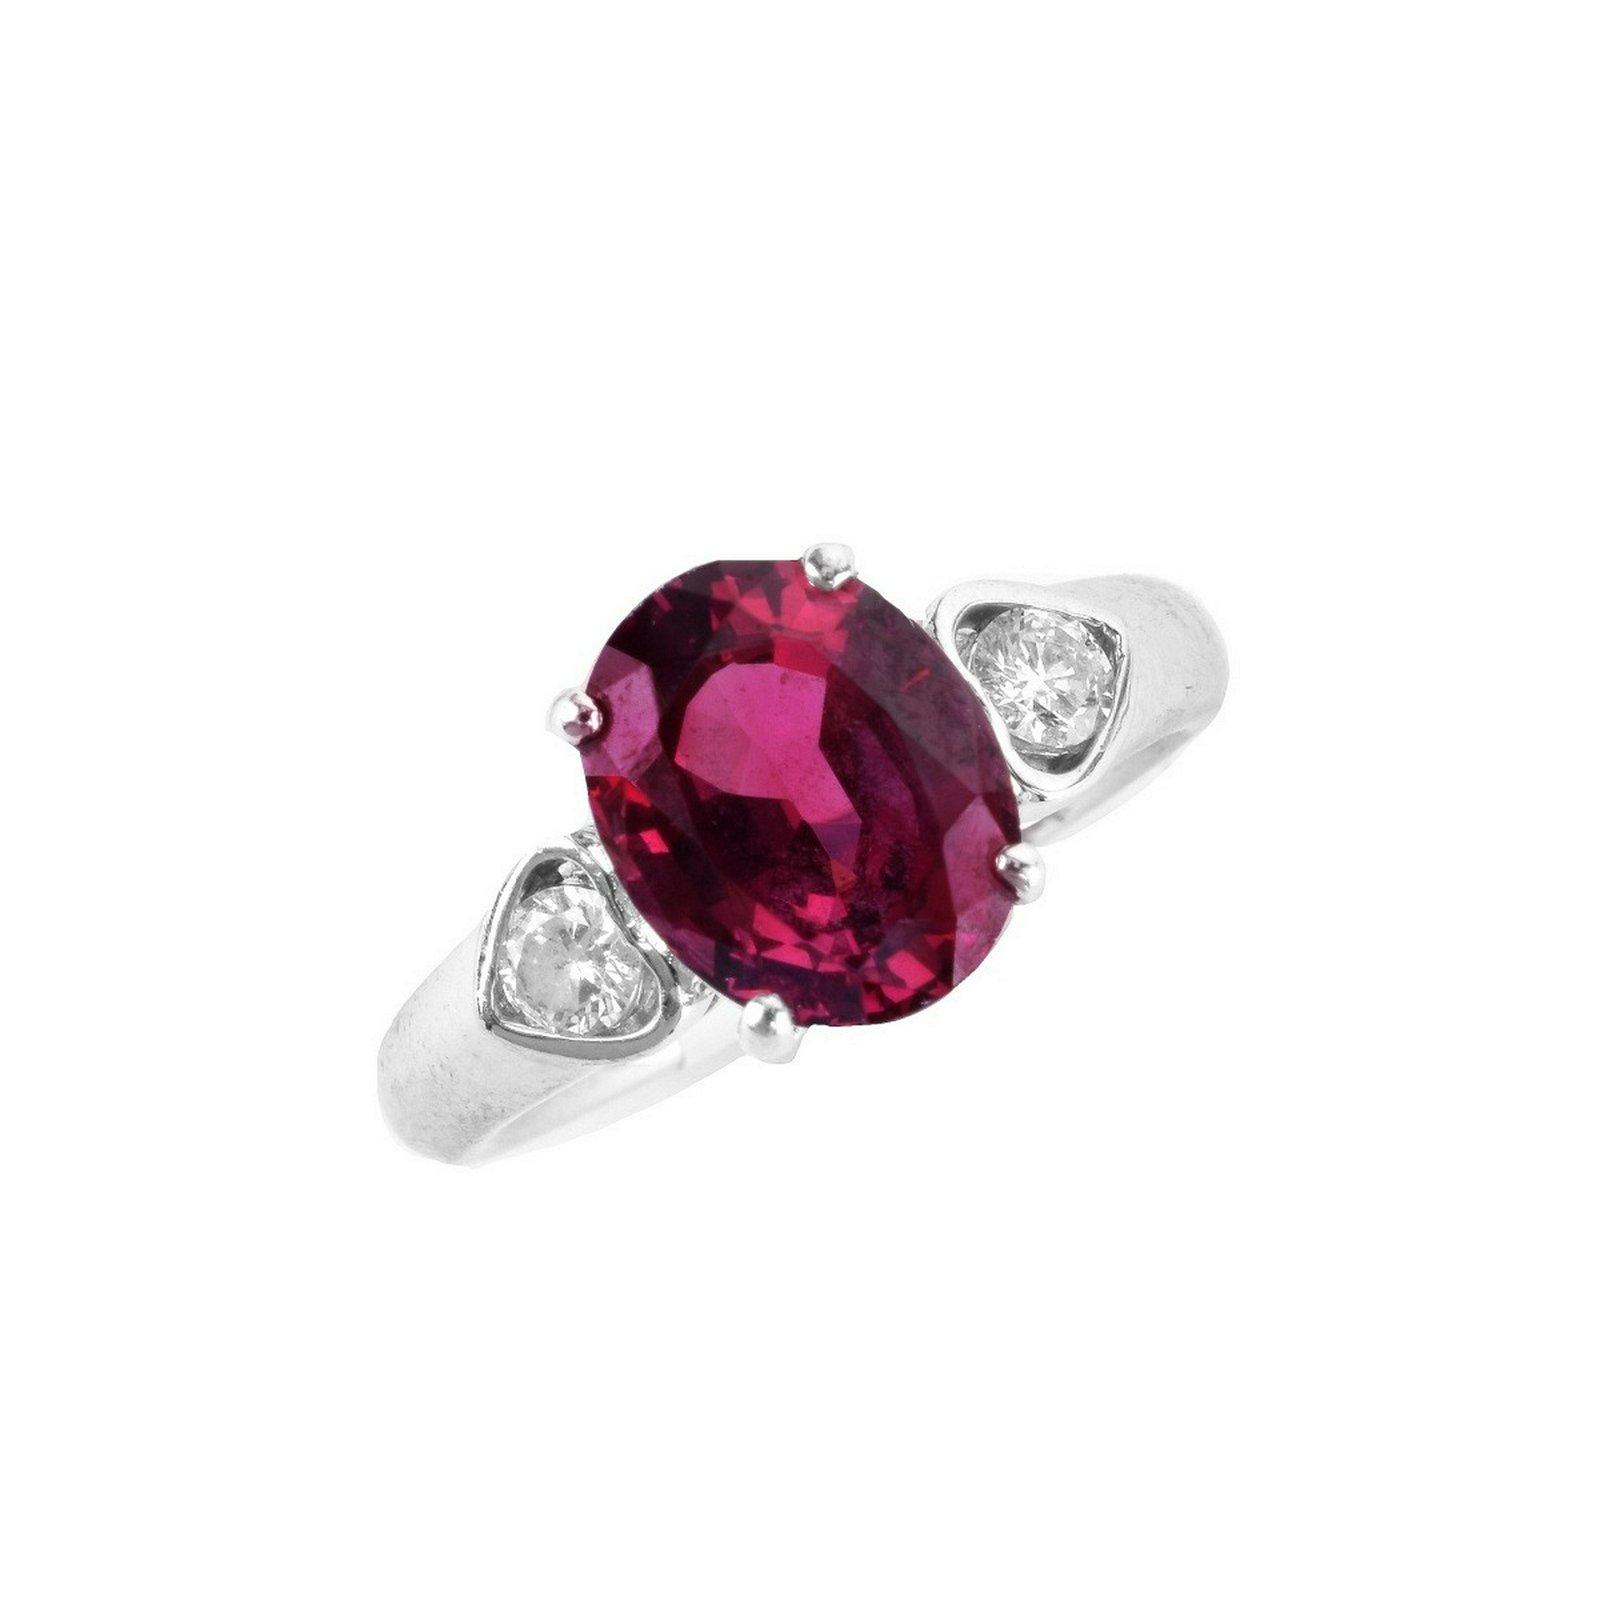 Garnet, Diamond and Platinum Ring